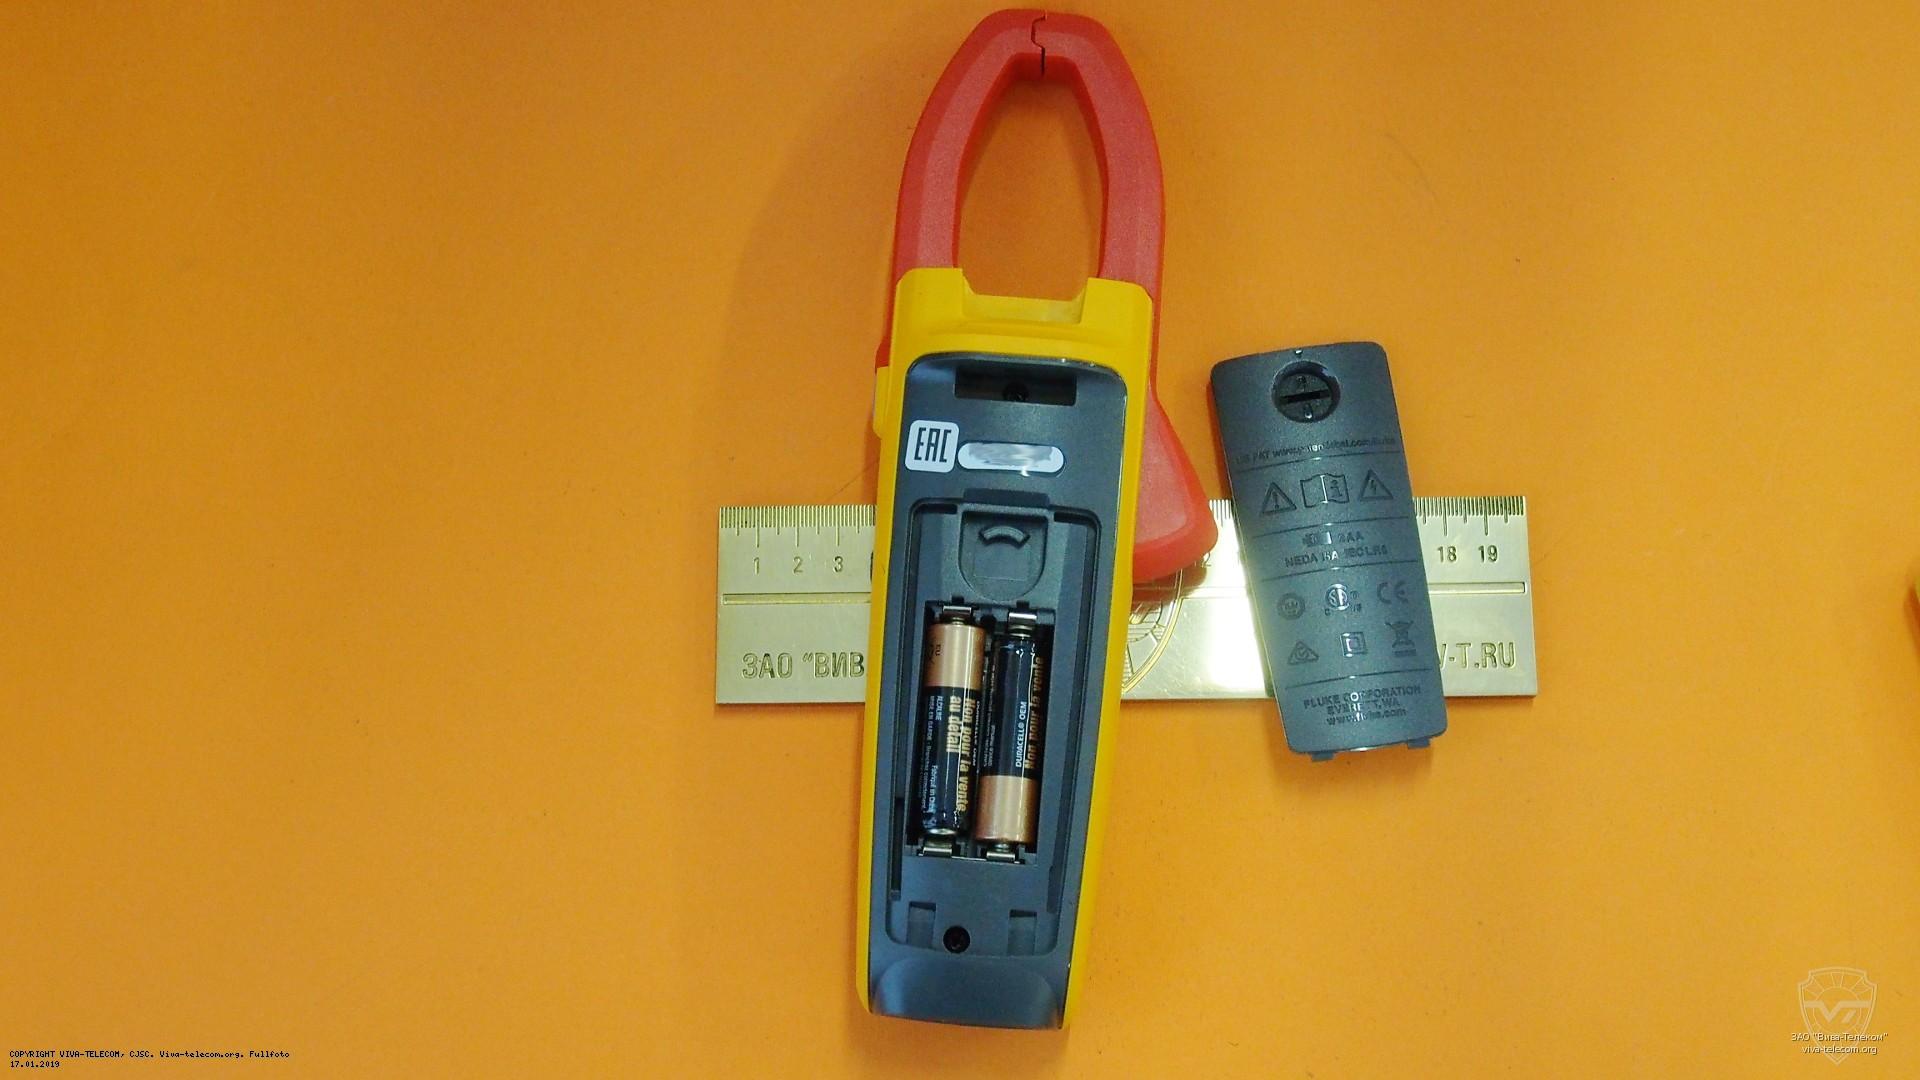 Батарейный отсек Fluke 376, элементы питания | фотография от